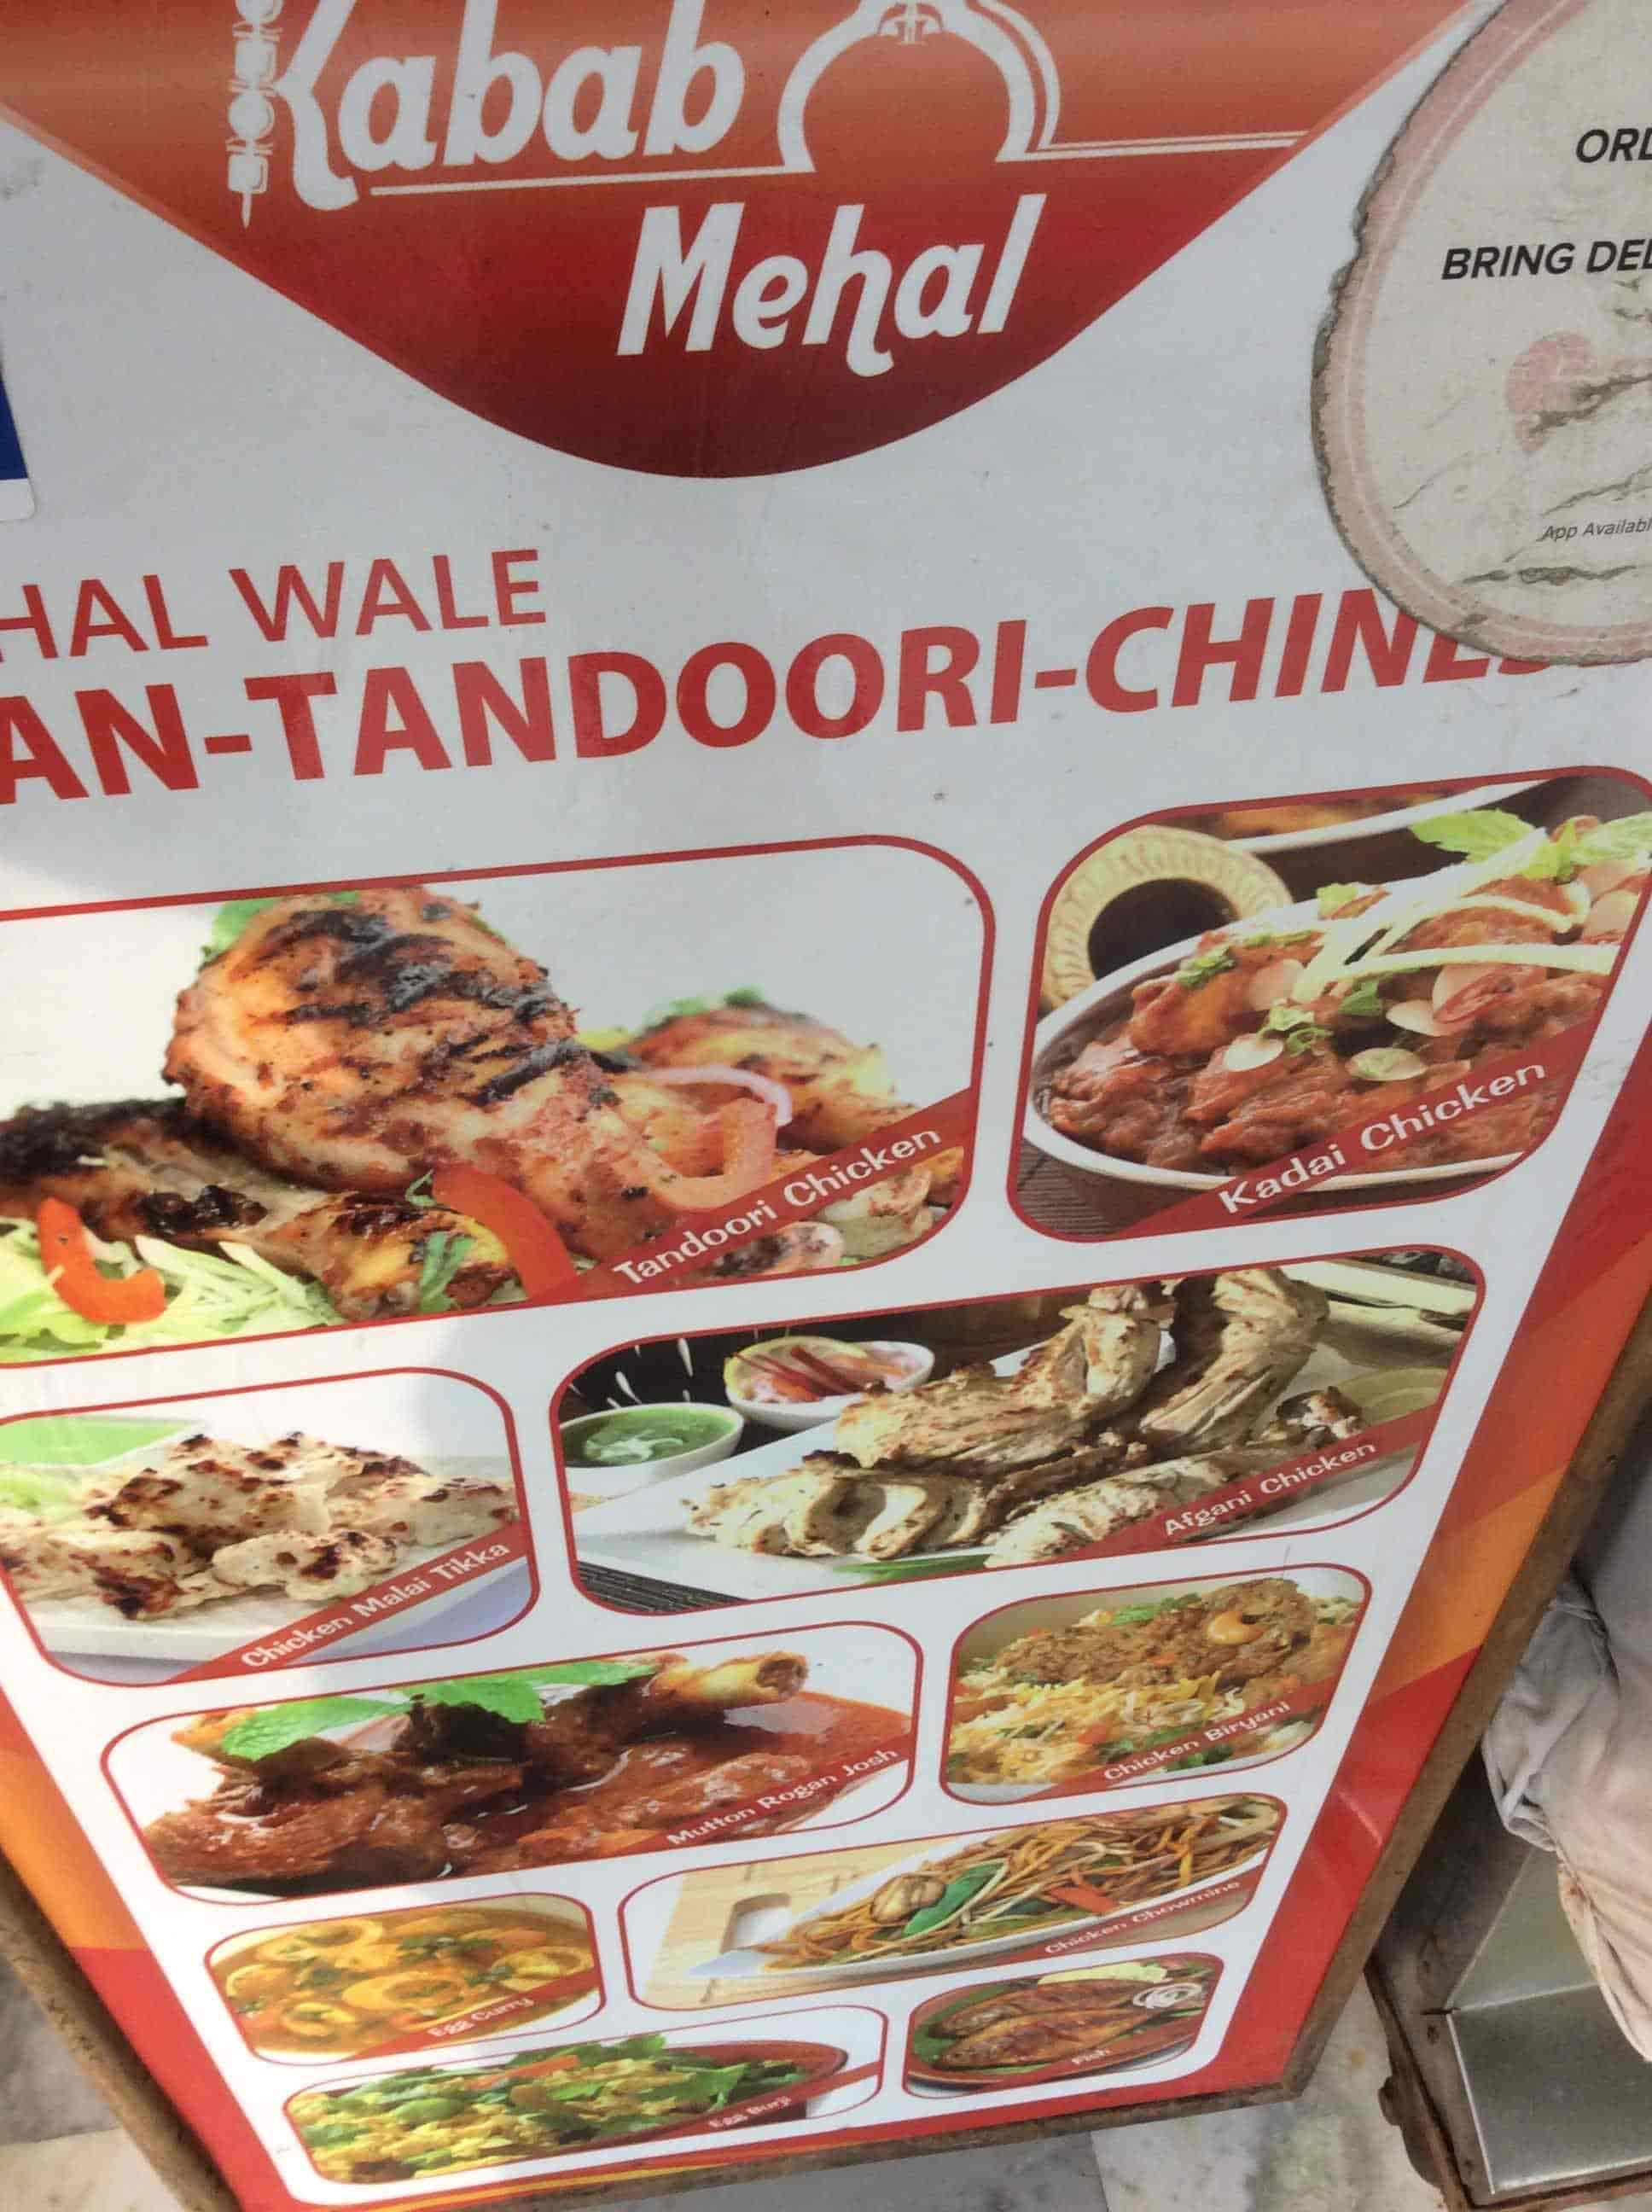 kabab mehal sector 44d chandigarh tandoori indian cuisine